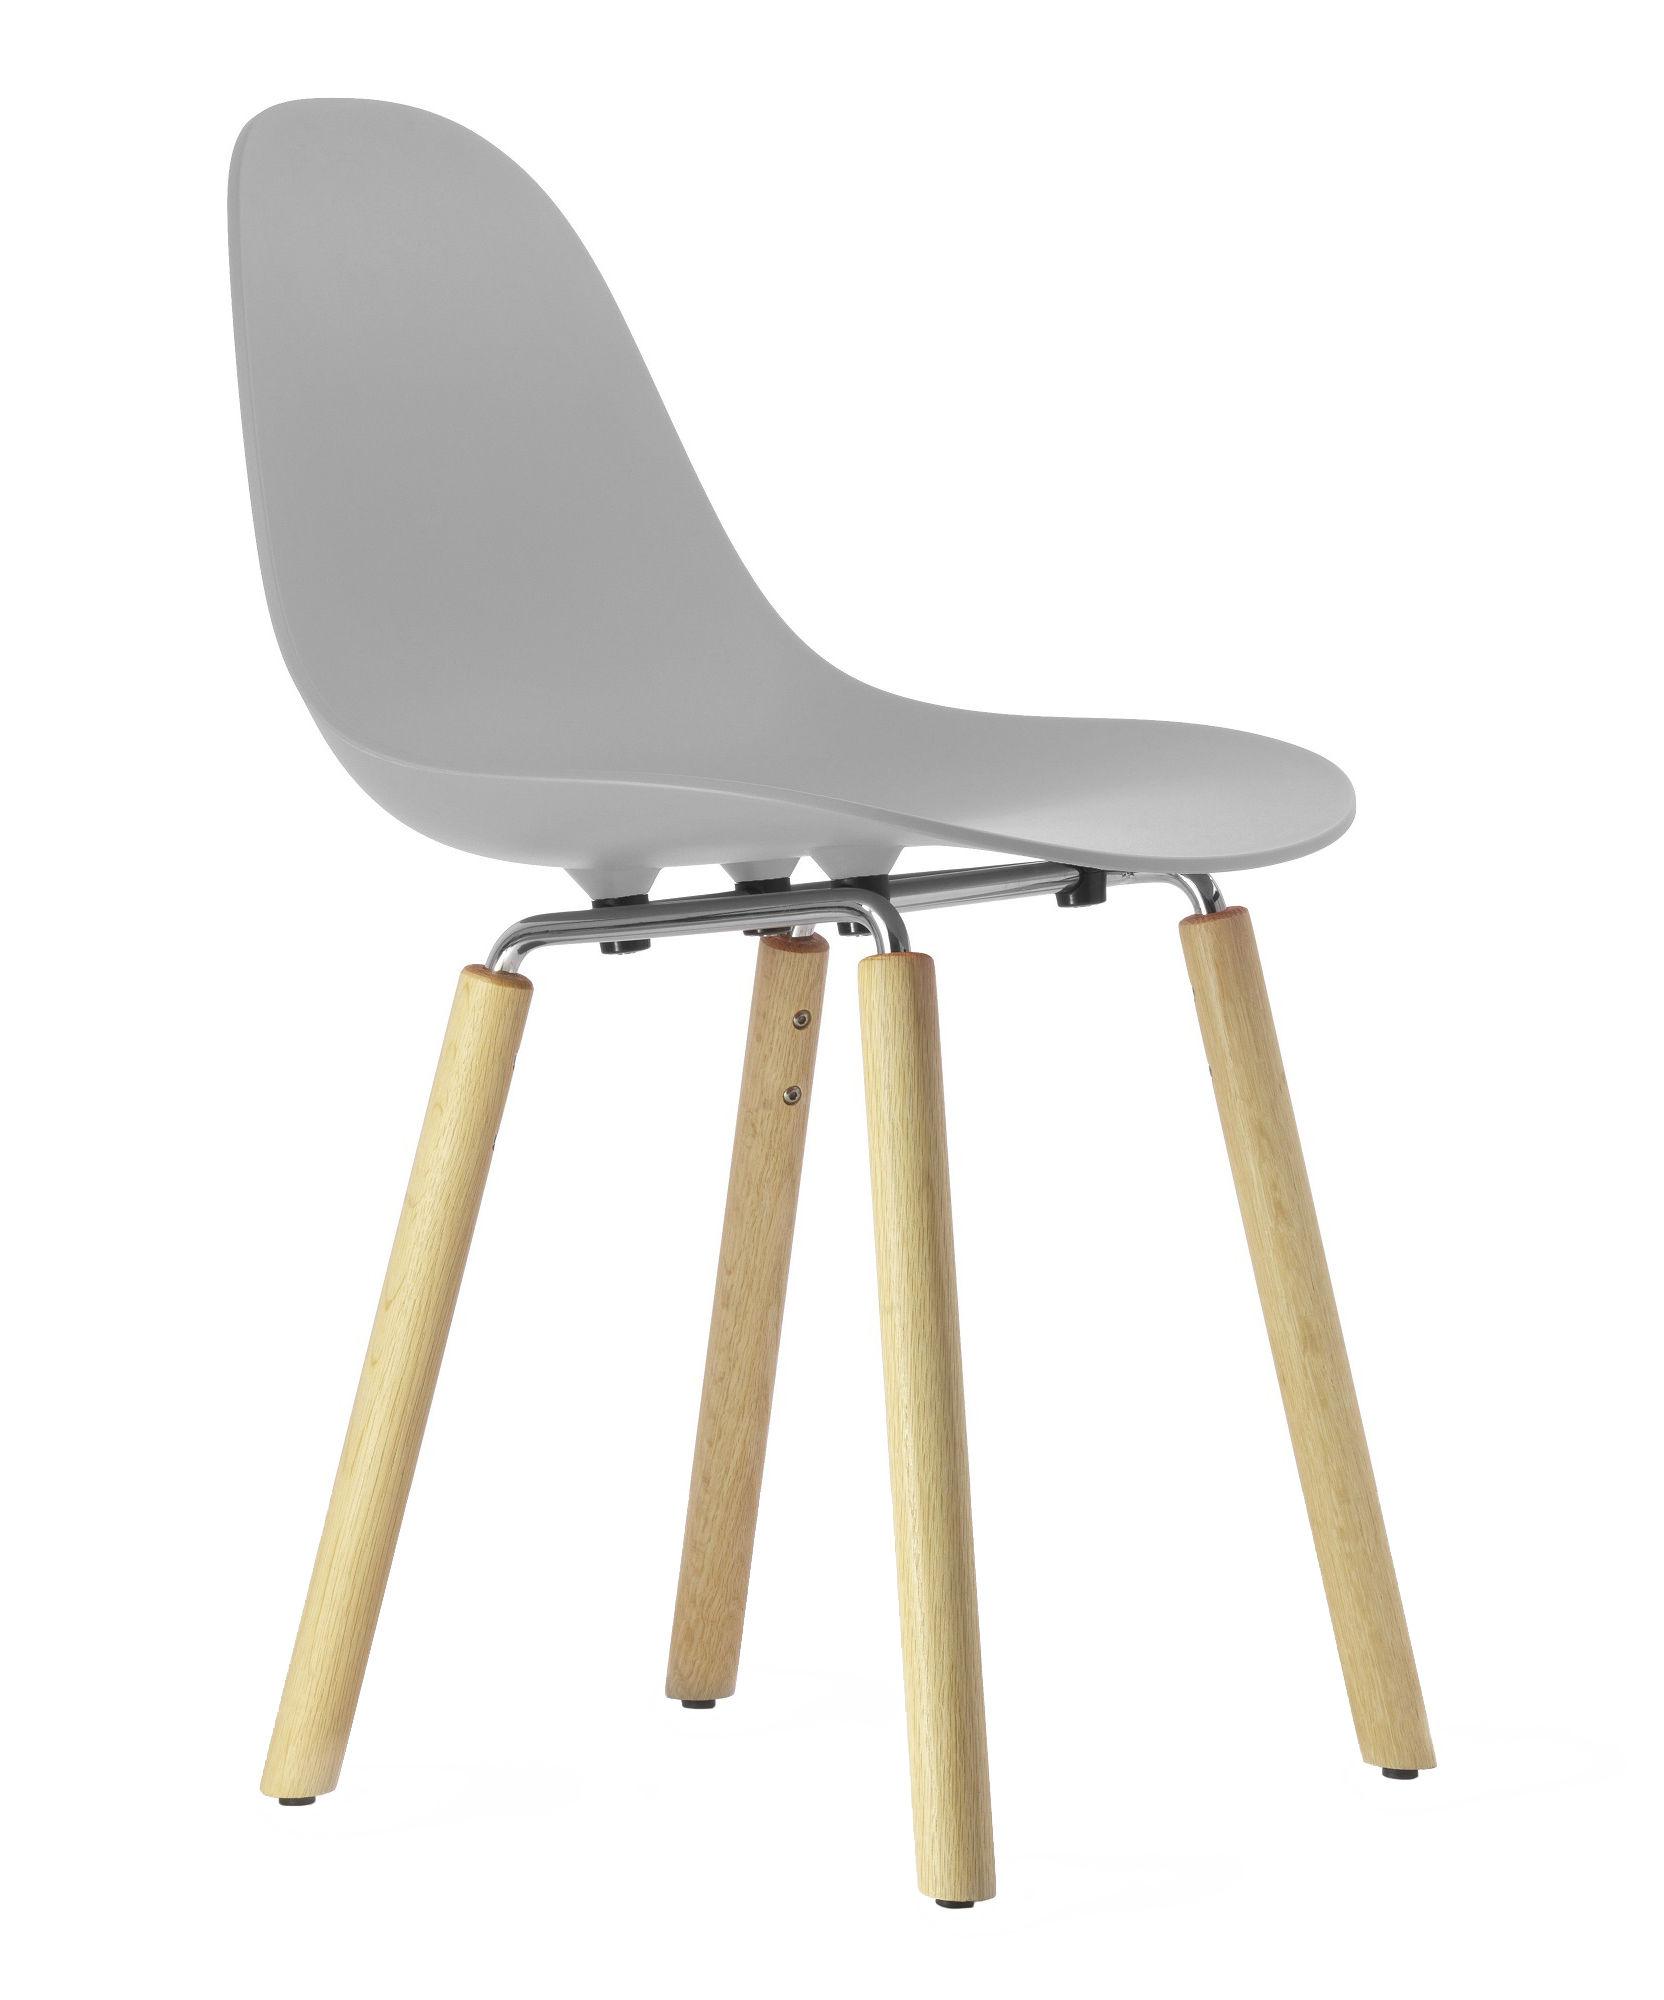 Furniture - Chairs - TA Chair - Wood legs by Toou - Grey / Natural wood legs - Chromed metal, Natural oak, Polypropylene